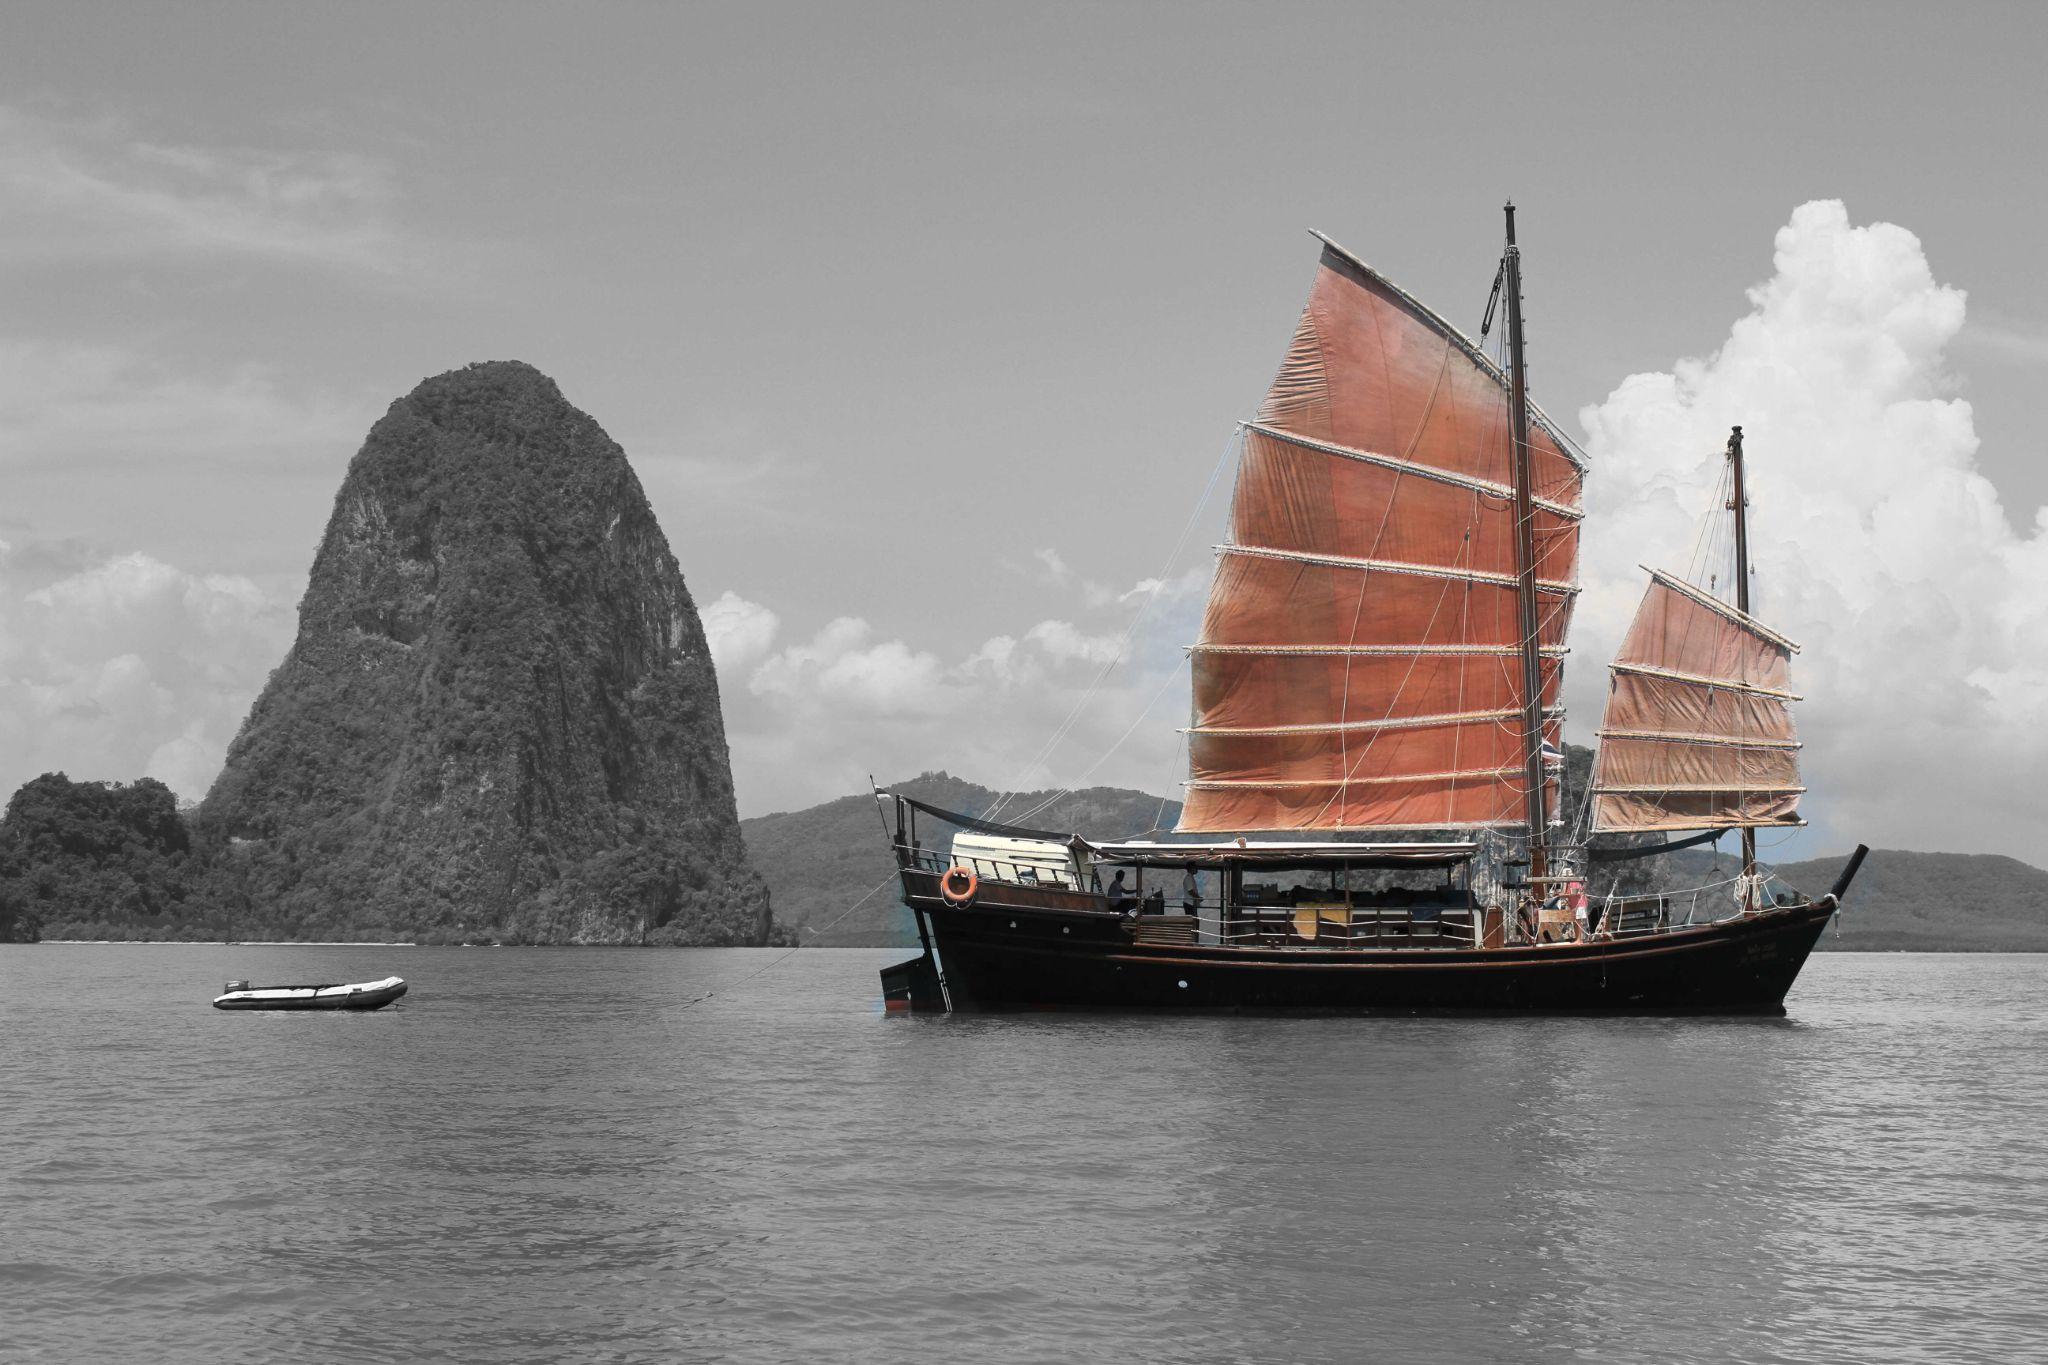 Golden Sail by my world photos